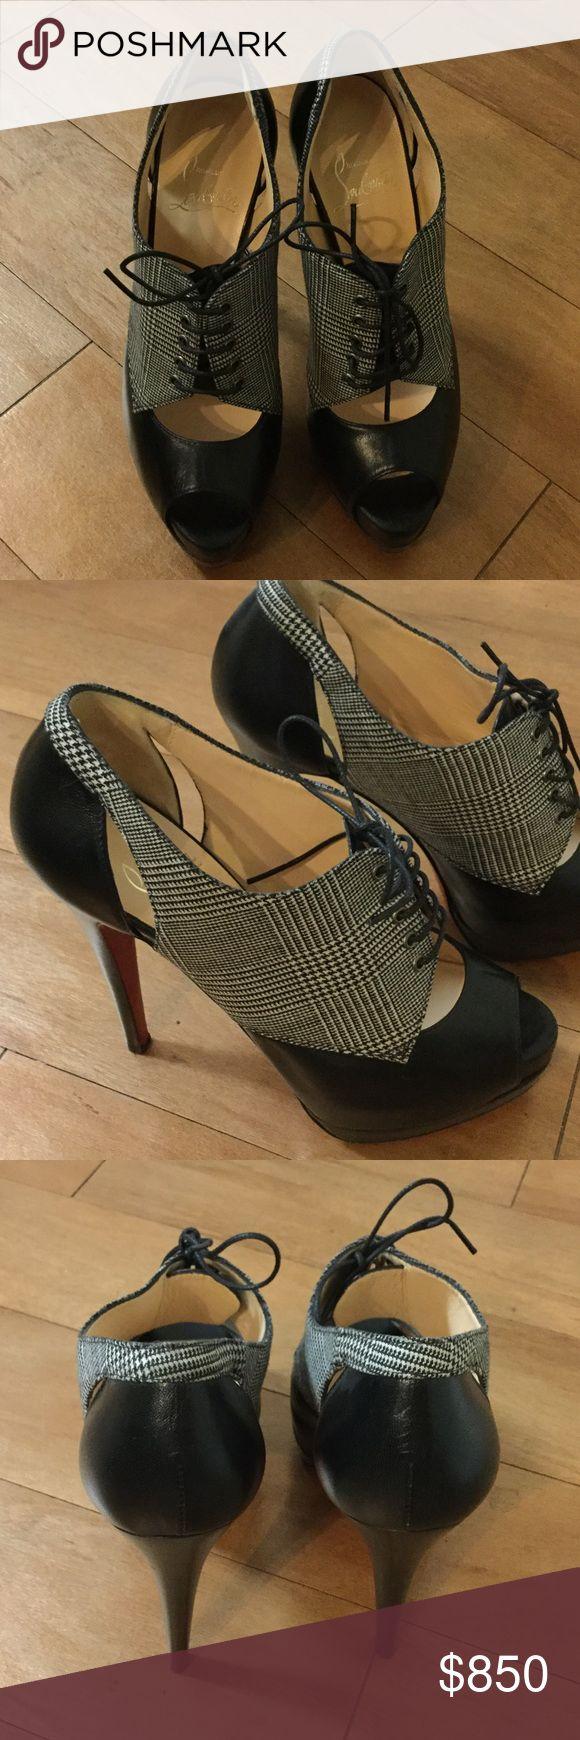 "Christian Louboutin Black Houndstooth Booties Uber fierce, NWOB. NWOT. 5"" heels. No dustbag, no box. Christian Louboutin Shoes Ankle Boots & Booties"